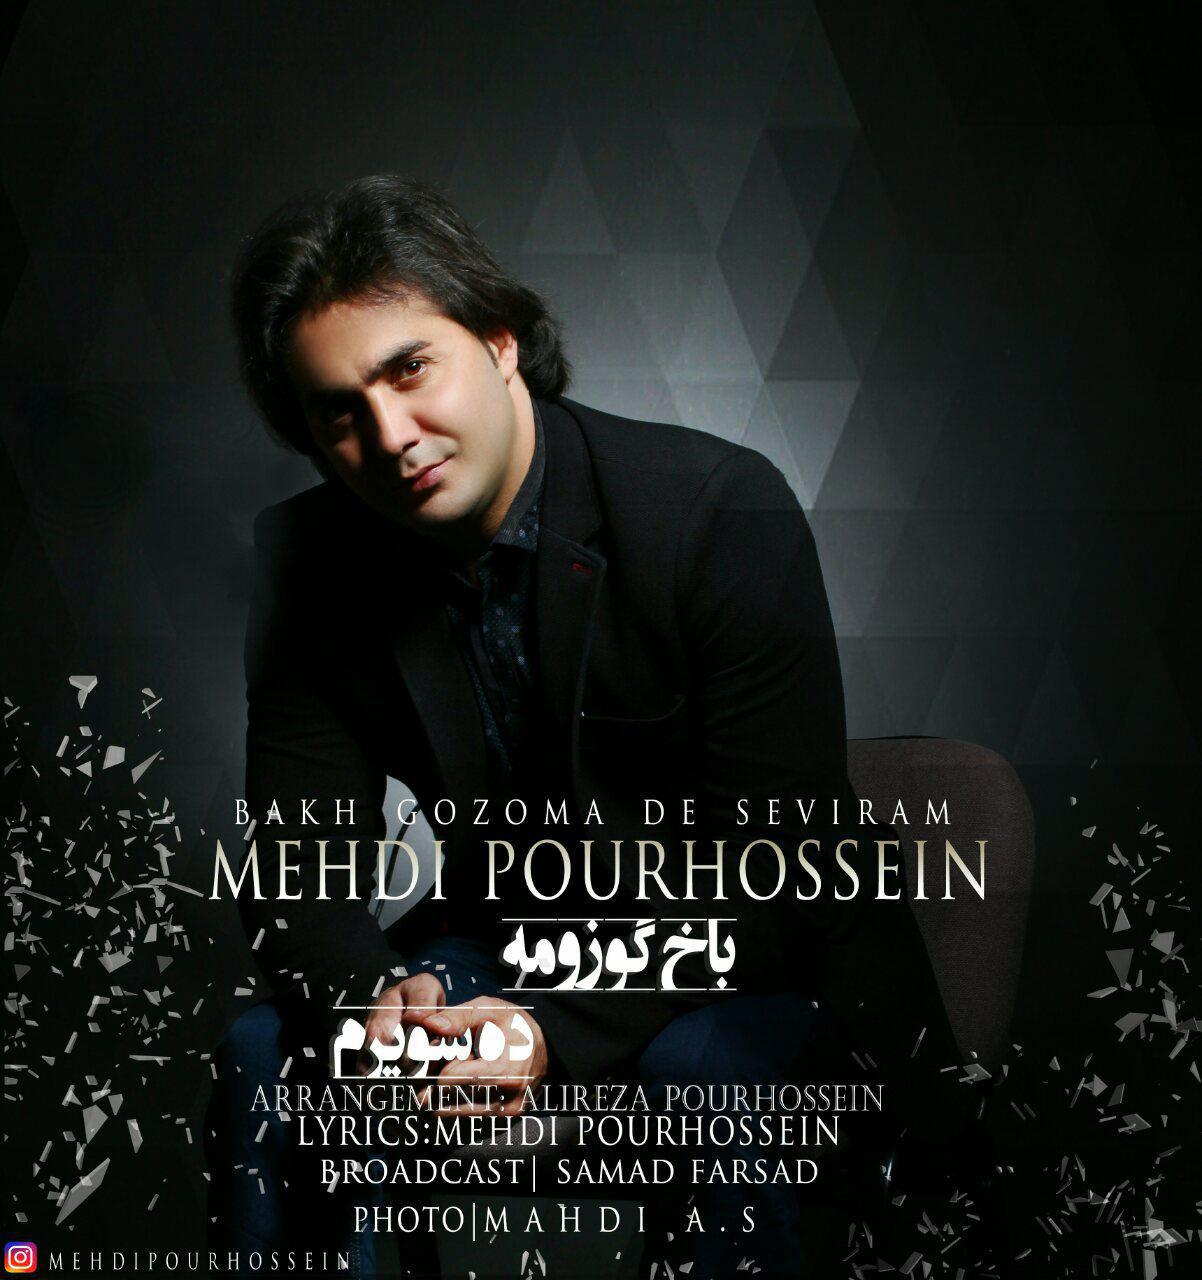 http://s9.picofile.com/file/8268335426/Mehdi_Pourhossein_Bakh_Gozoma_De_Seviram.jpg